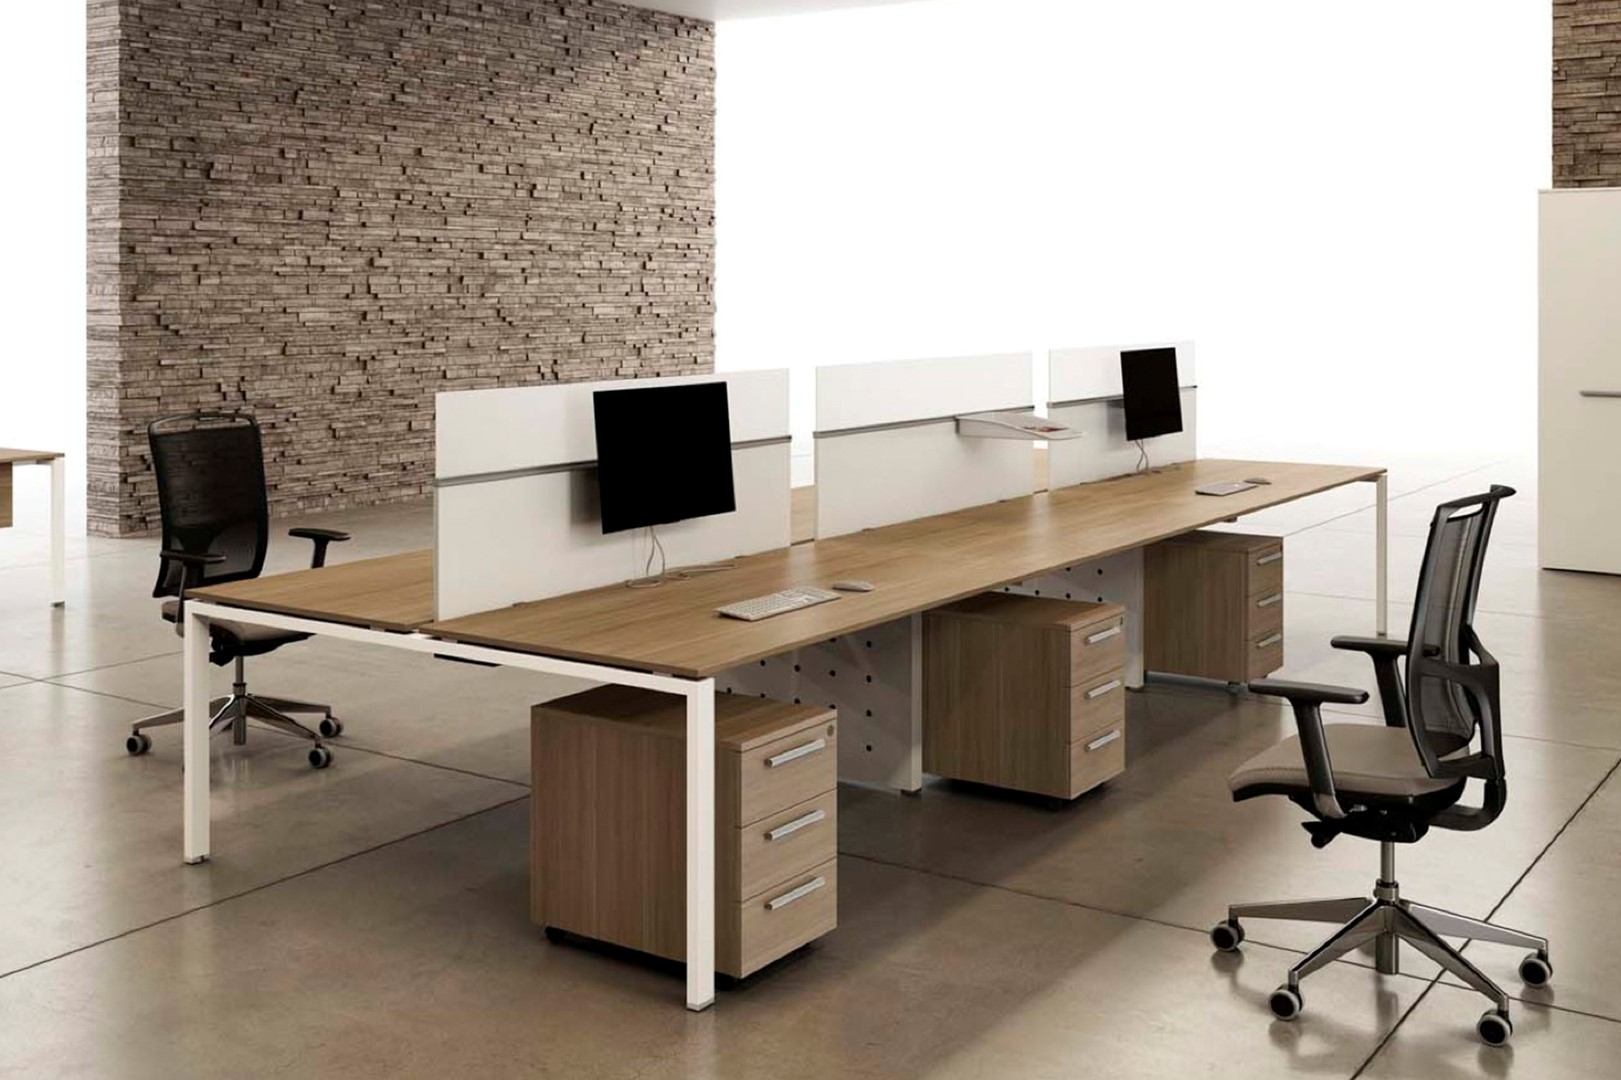 furniture_0008_2.operative desks_office furniture (4)